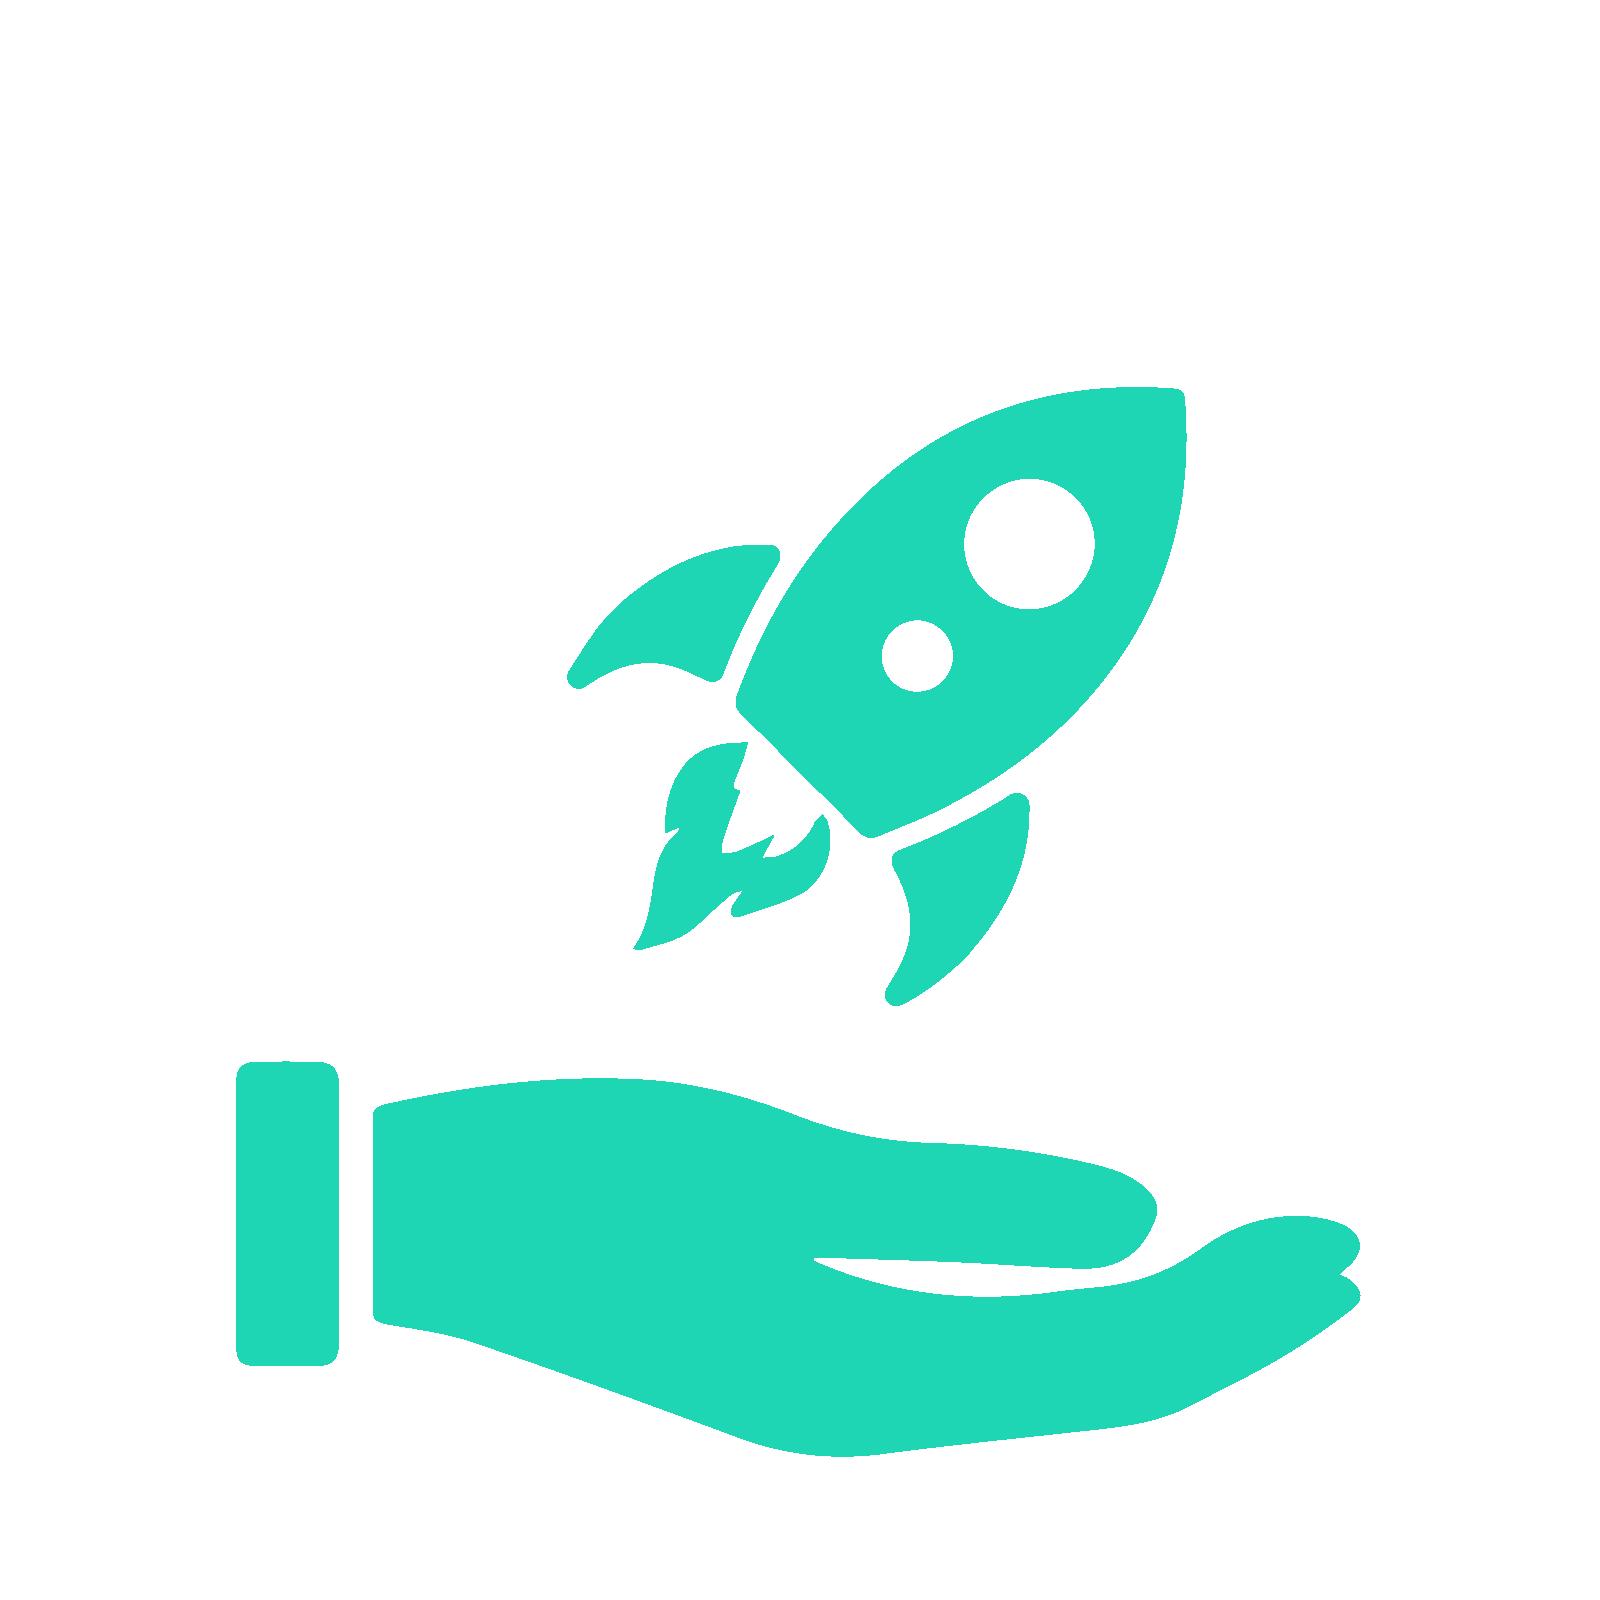 Start-up Support (1)